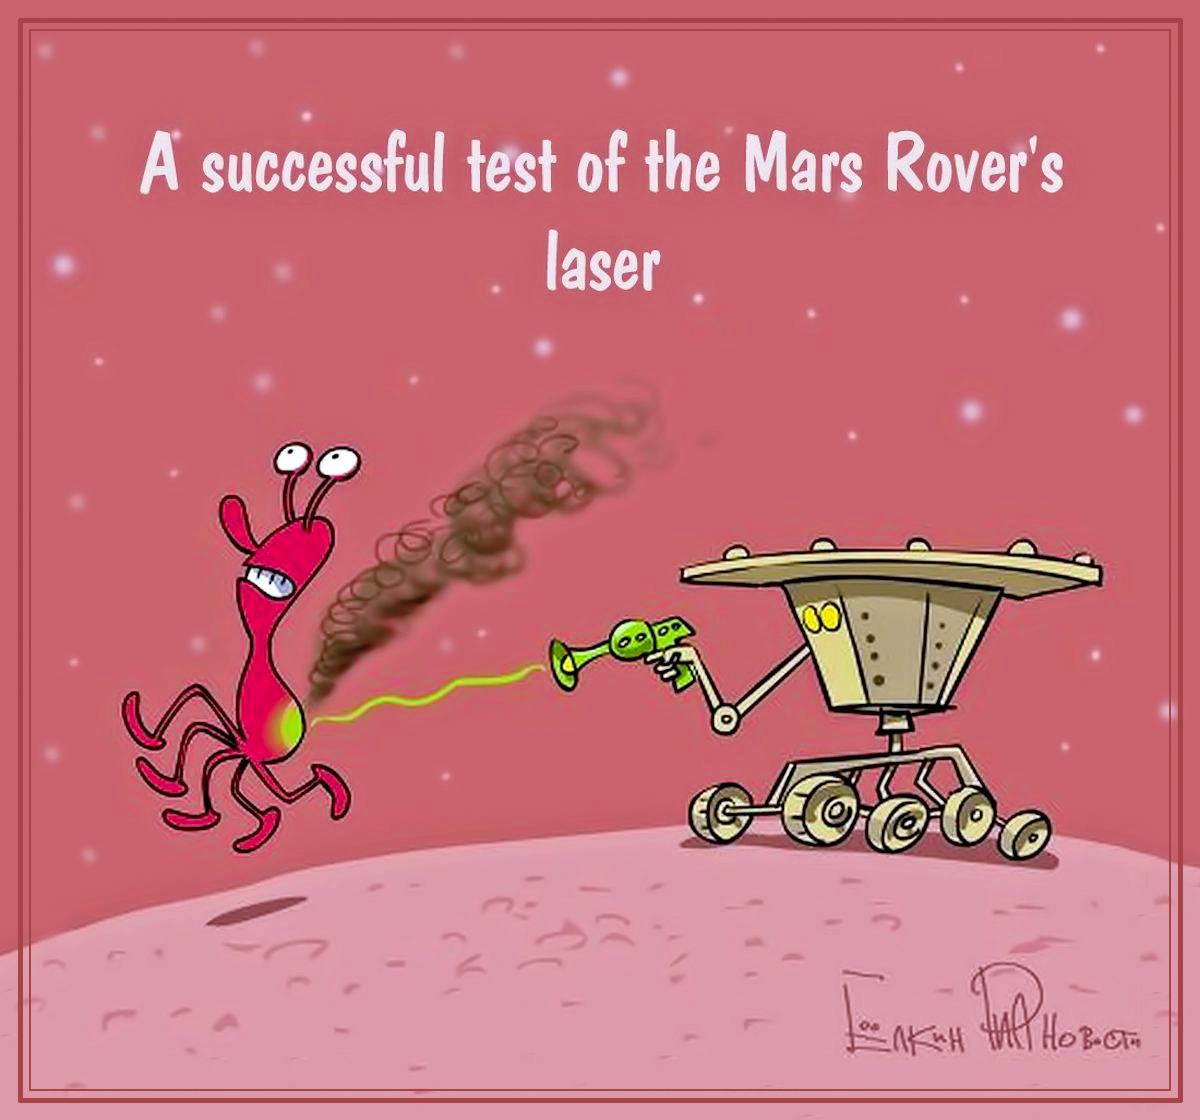 Sergei Yolkin. Life on Mars. Now, We Have a Laser! 2012